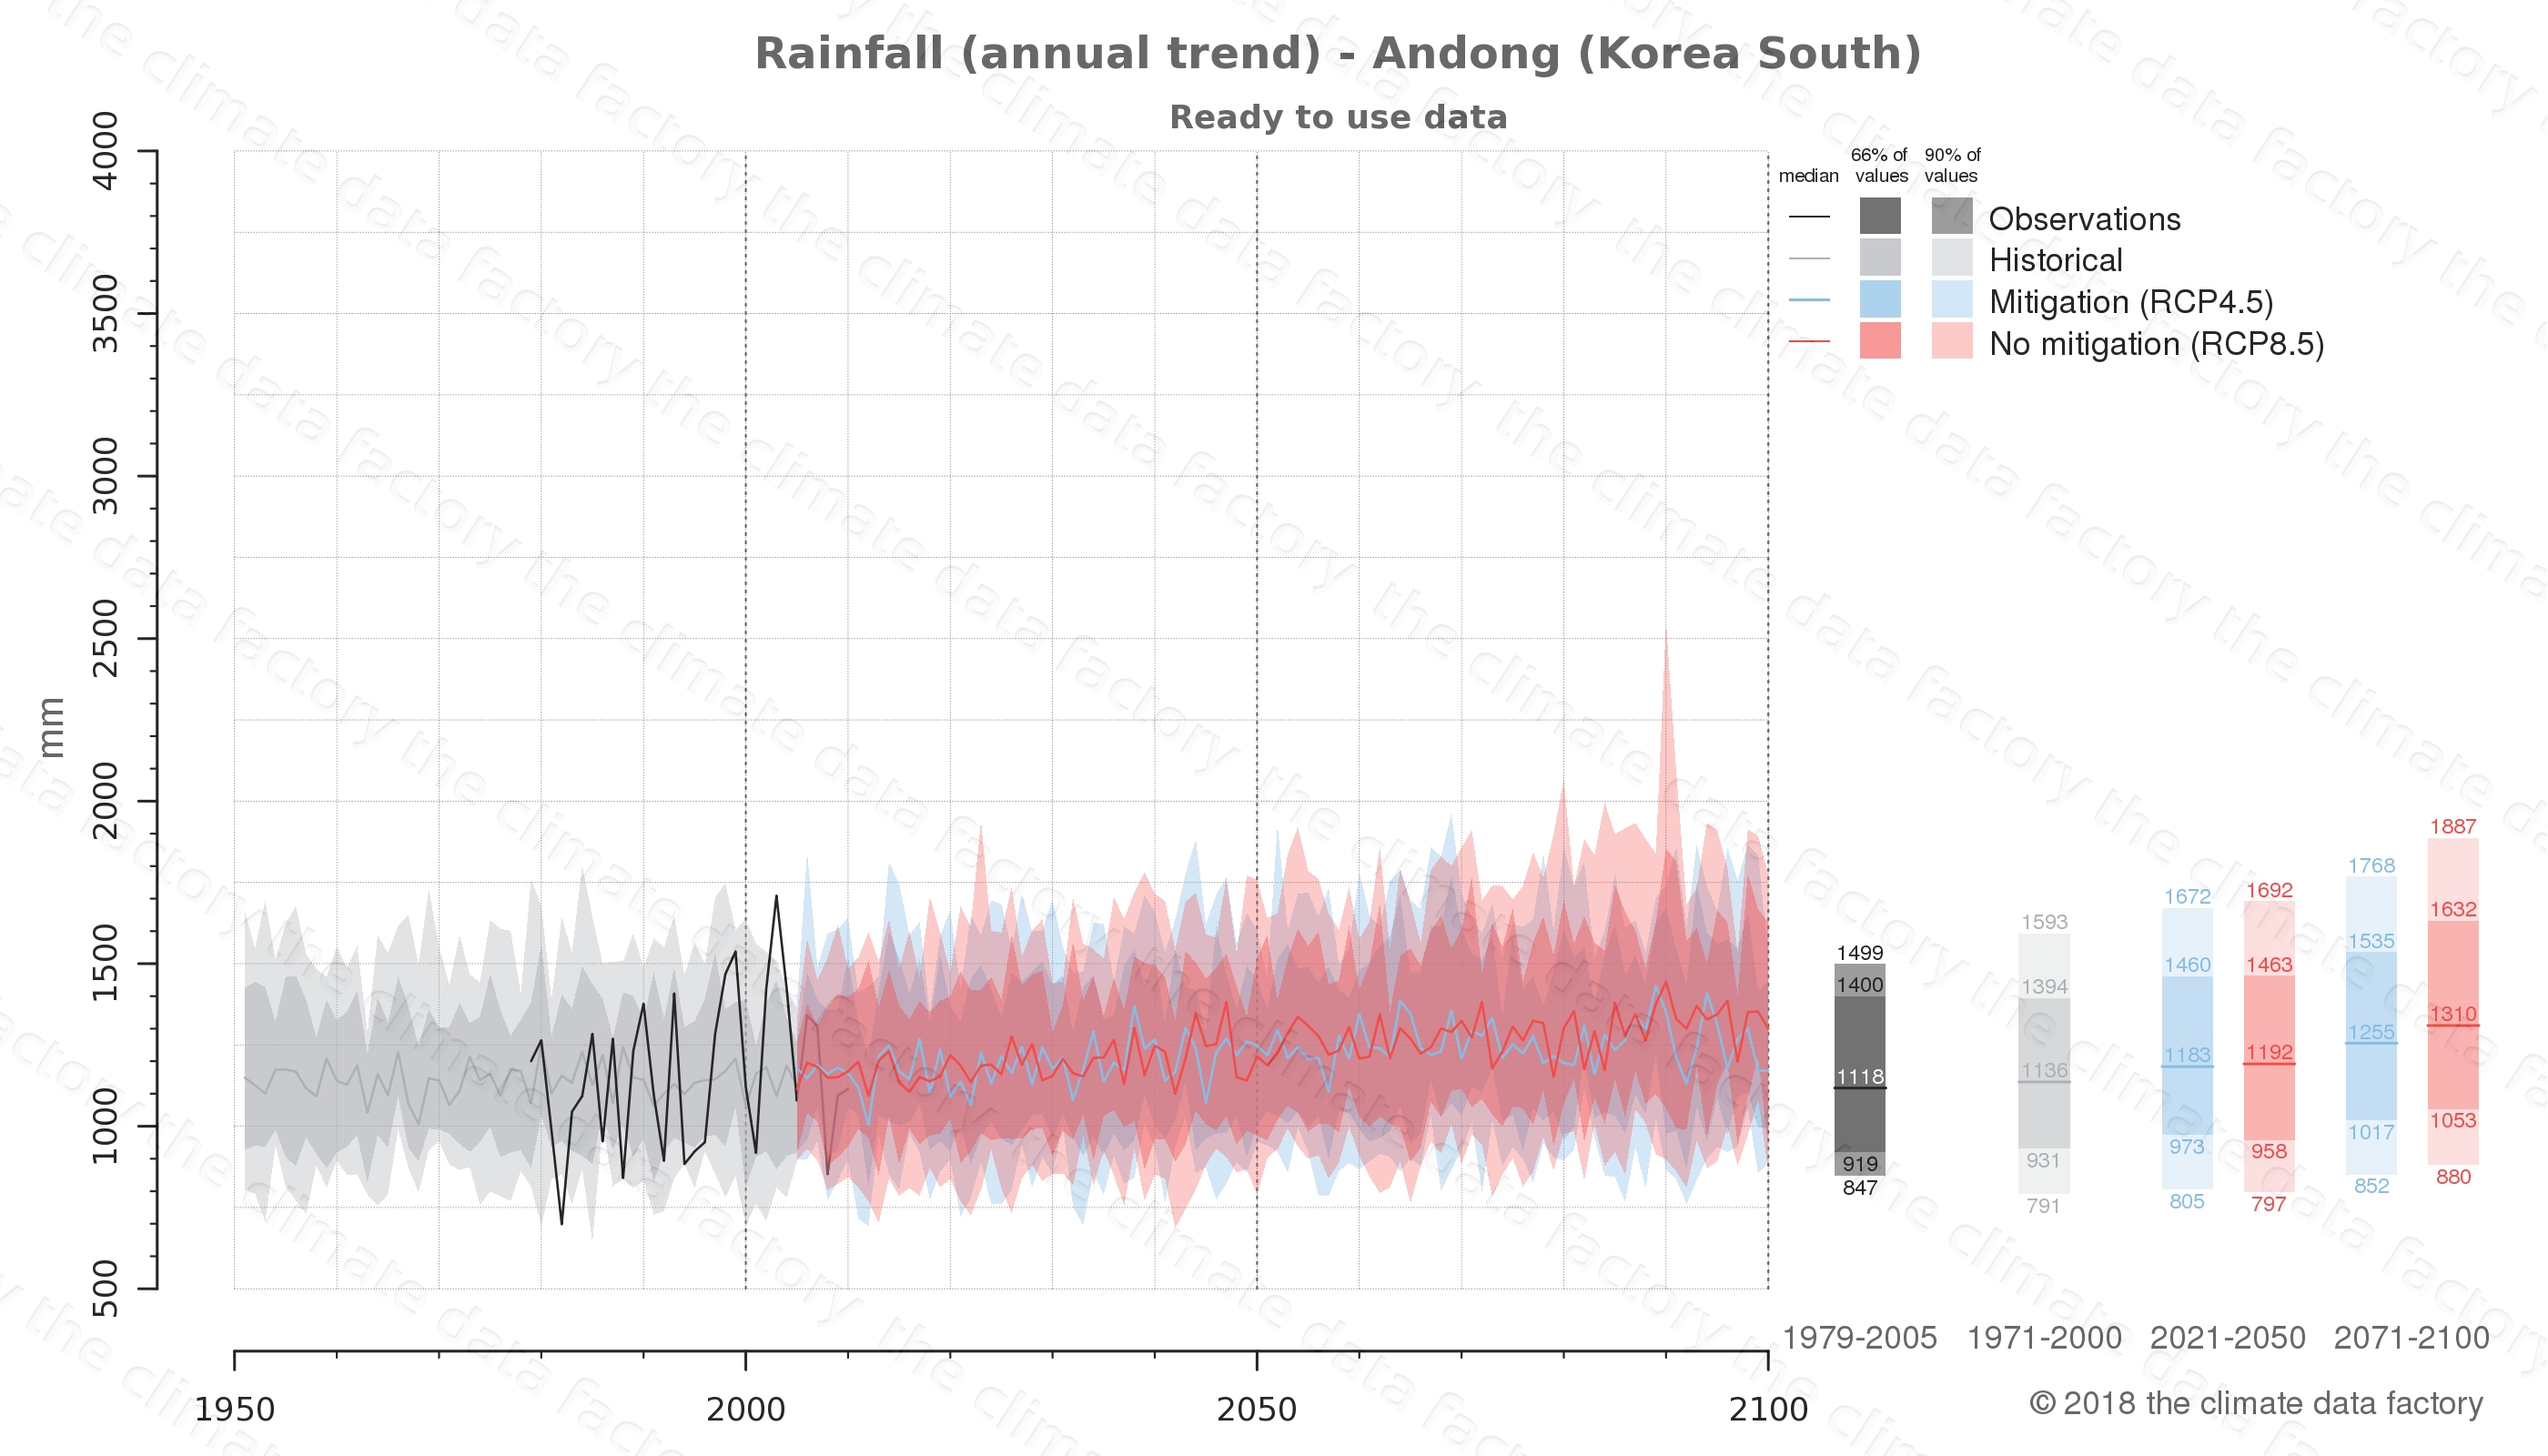 climate change data policy adaptation climate graph city data rainfall andong south korea